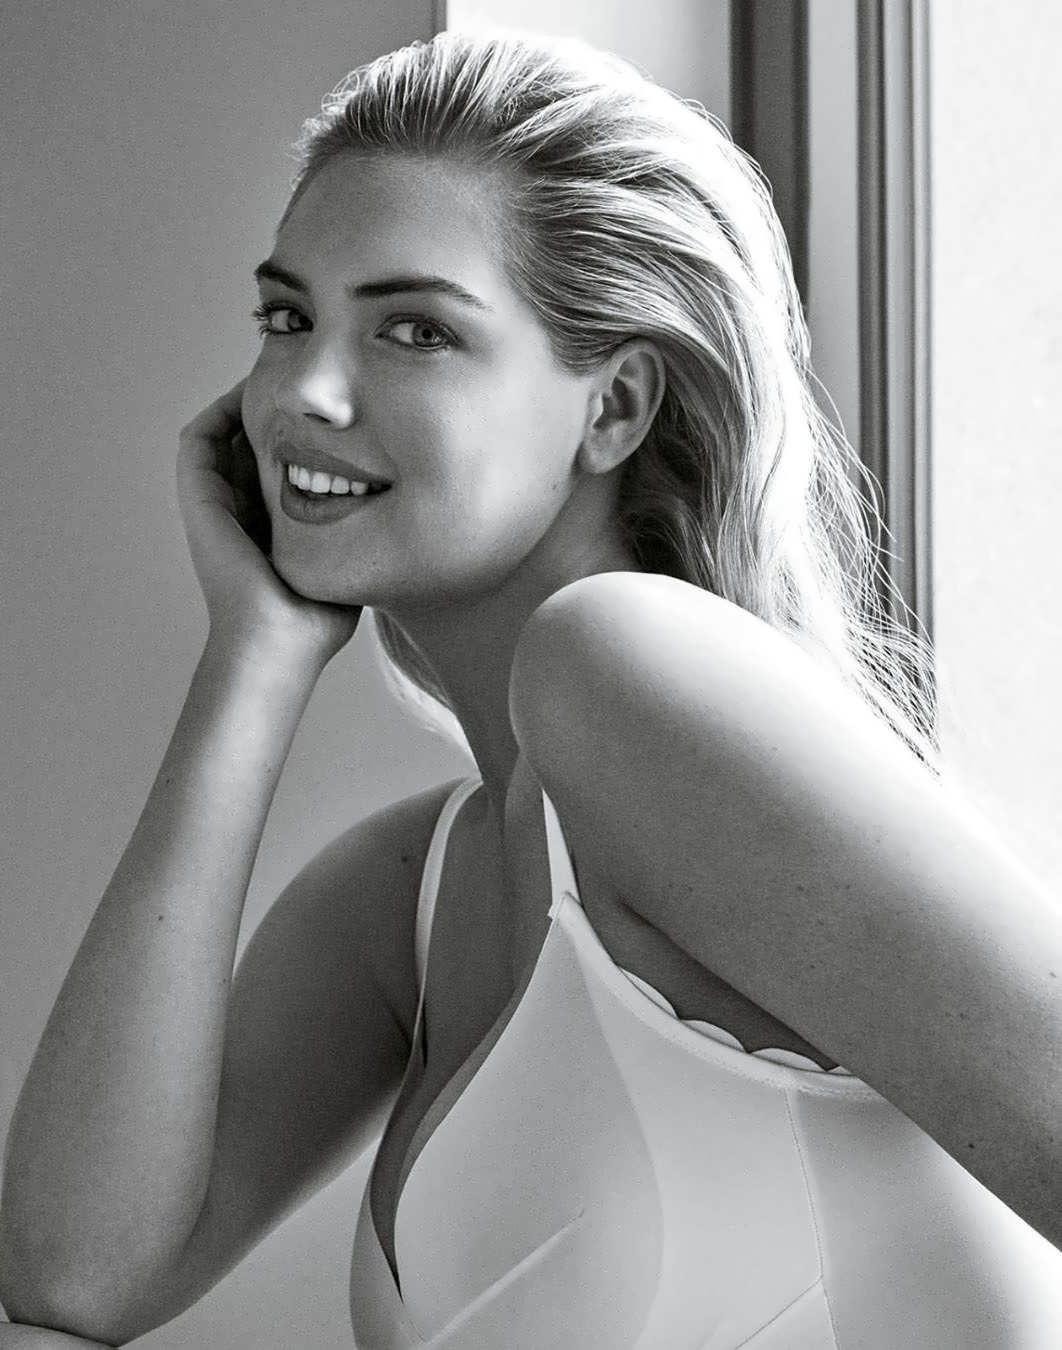 Kate Upton 2008